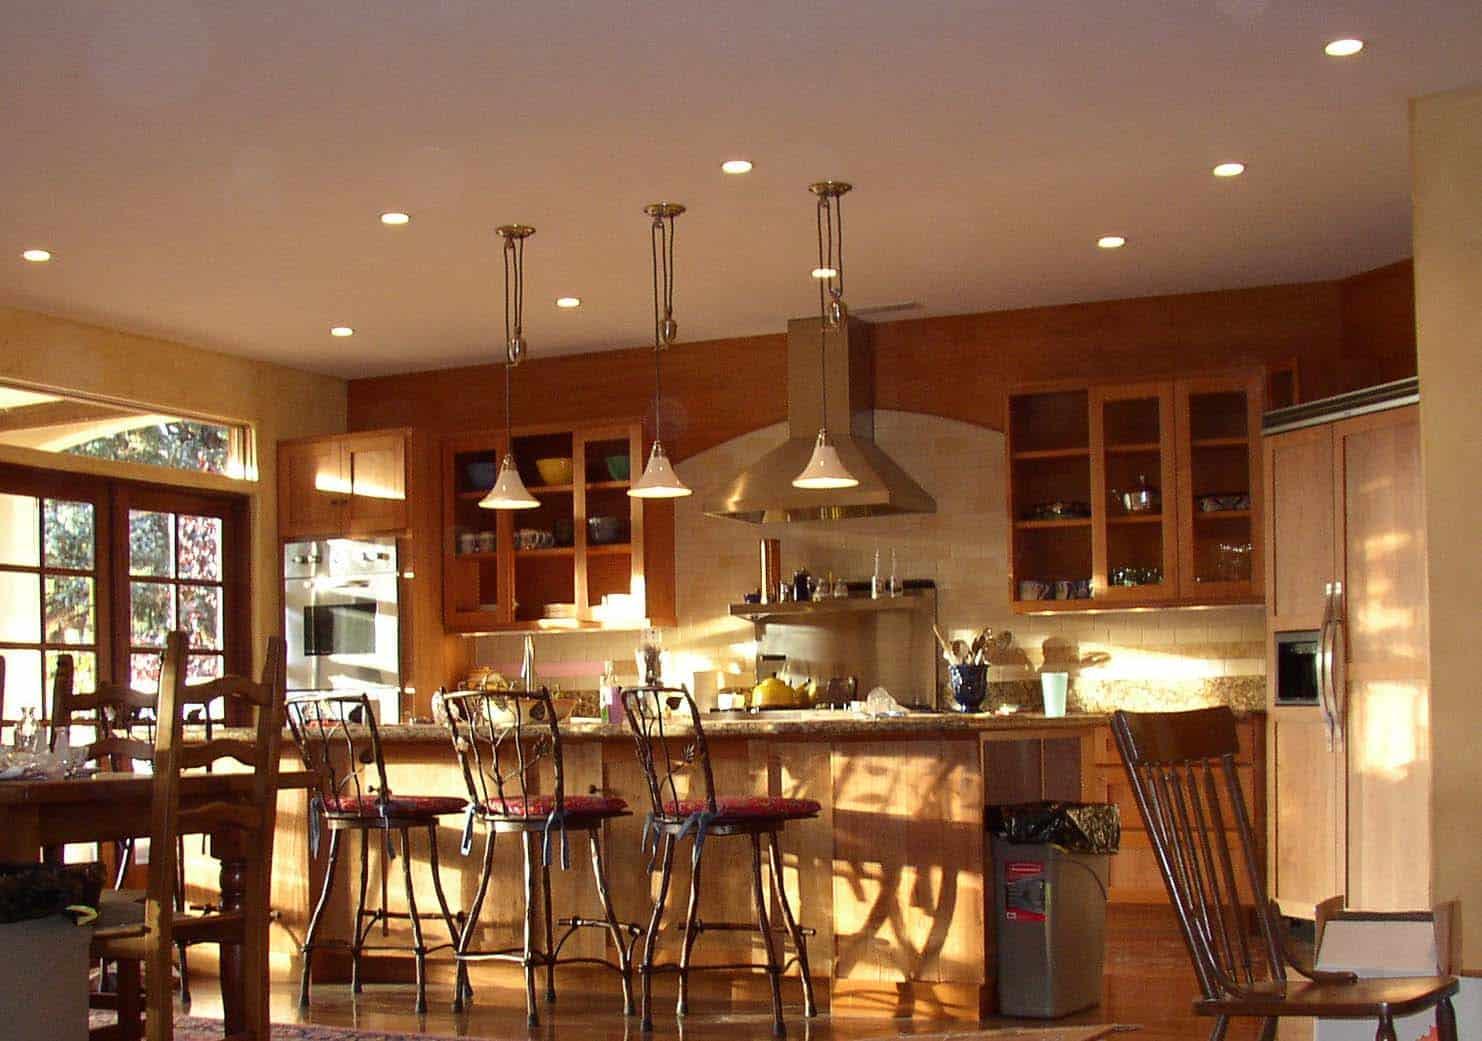 For Kitchen Lighting 29 Inspiring Kitchen Lighting Ideas Designbump